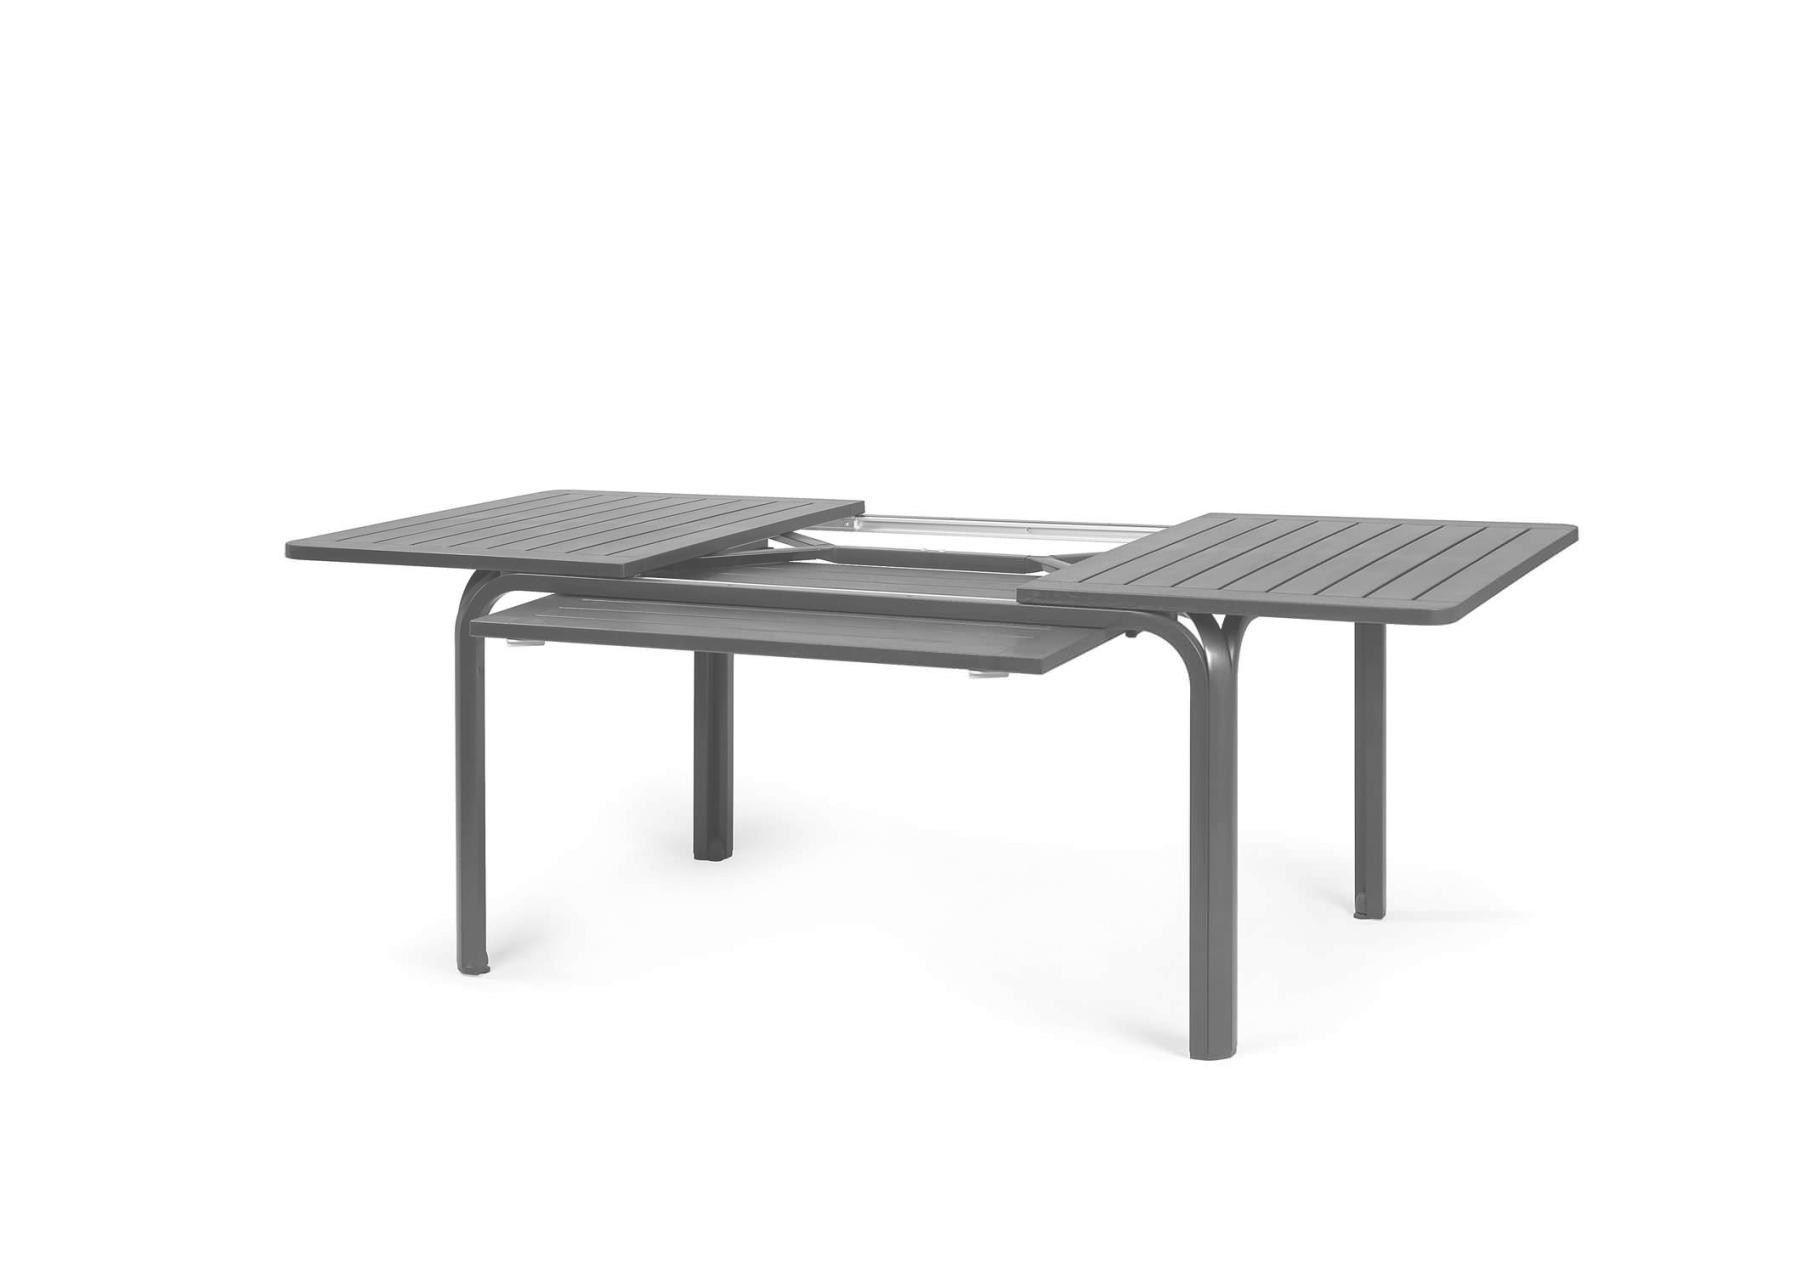 15 Amusant Table De Jardin Pliante Carrefour Pics Cool Furniture Reupholster Furniture Outdoor Decor